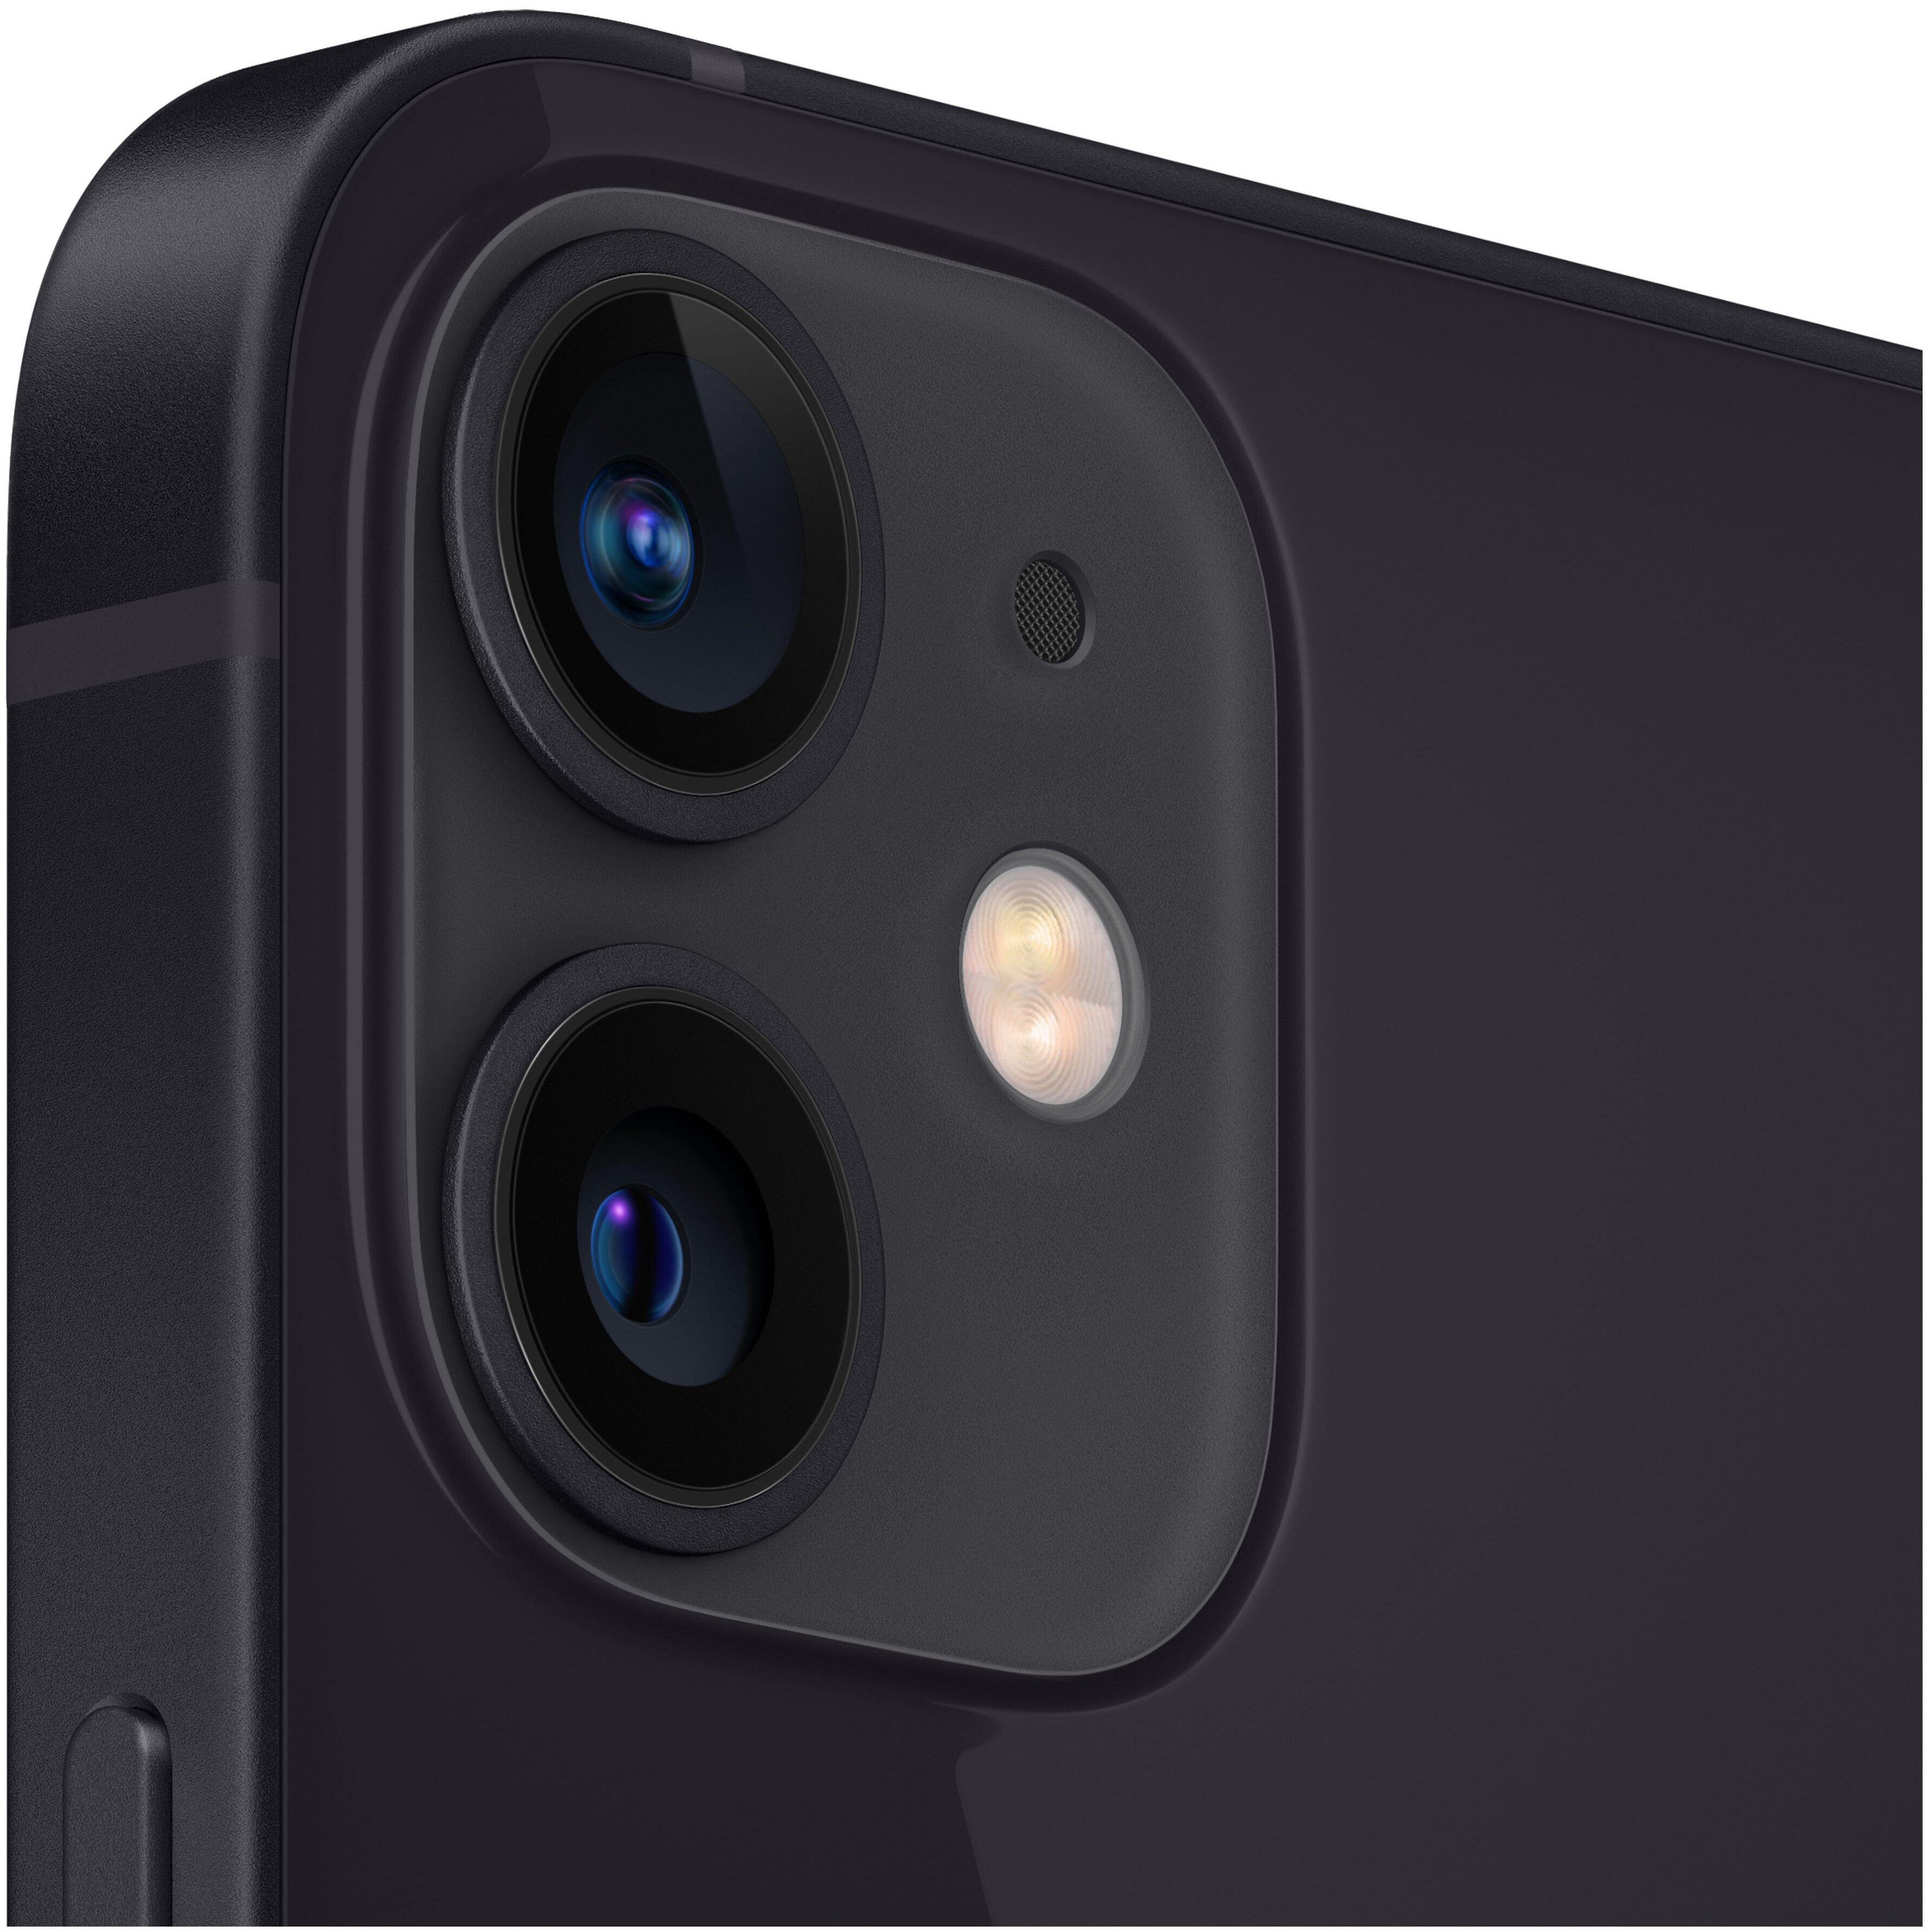 Apple iPhone 12 mini 128GB - степень защиты: IP68